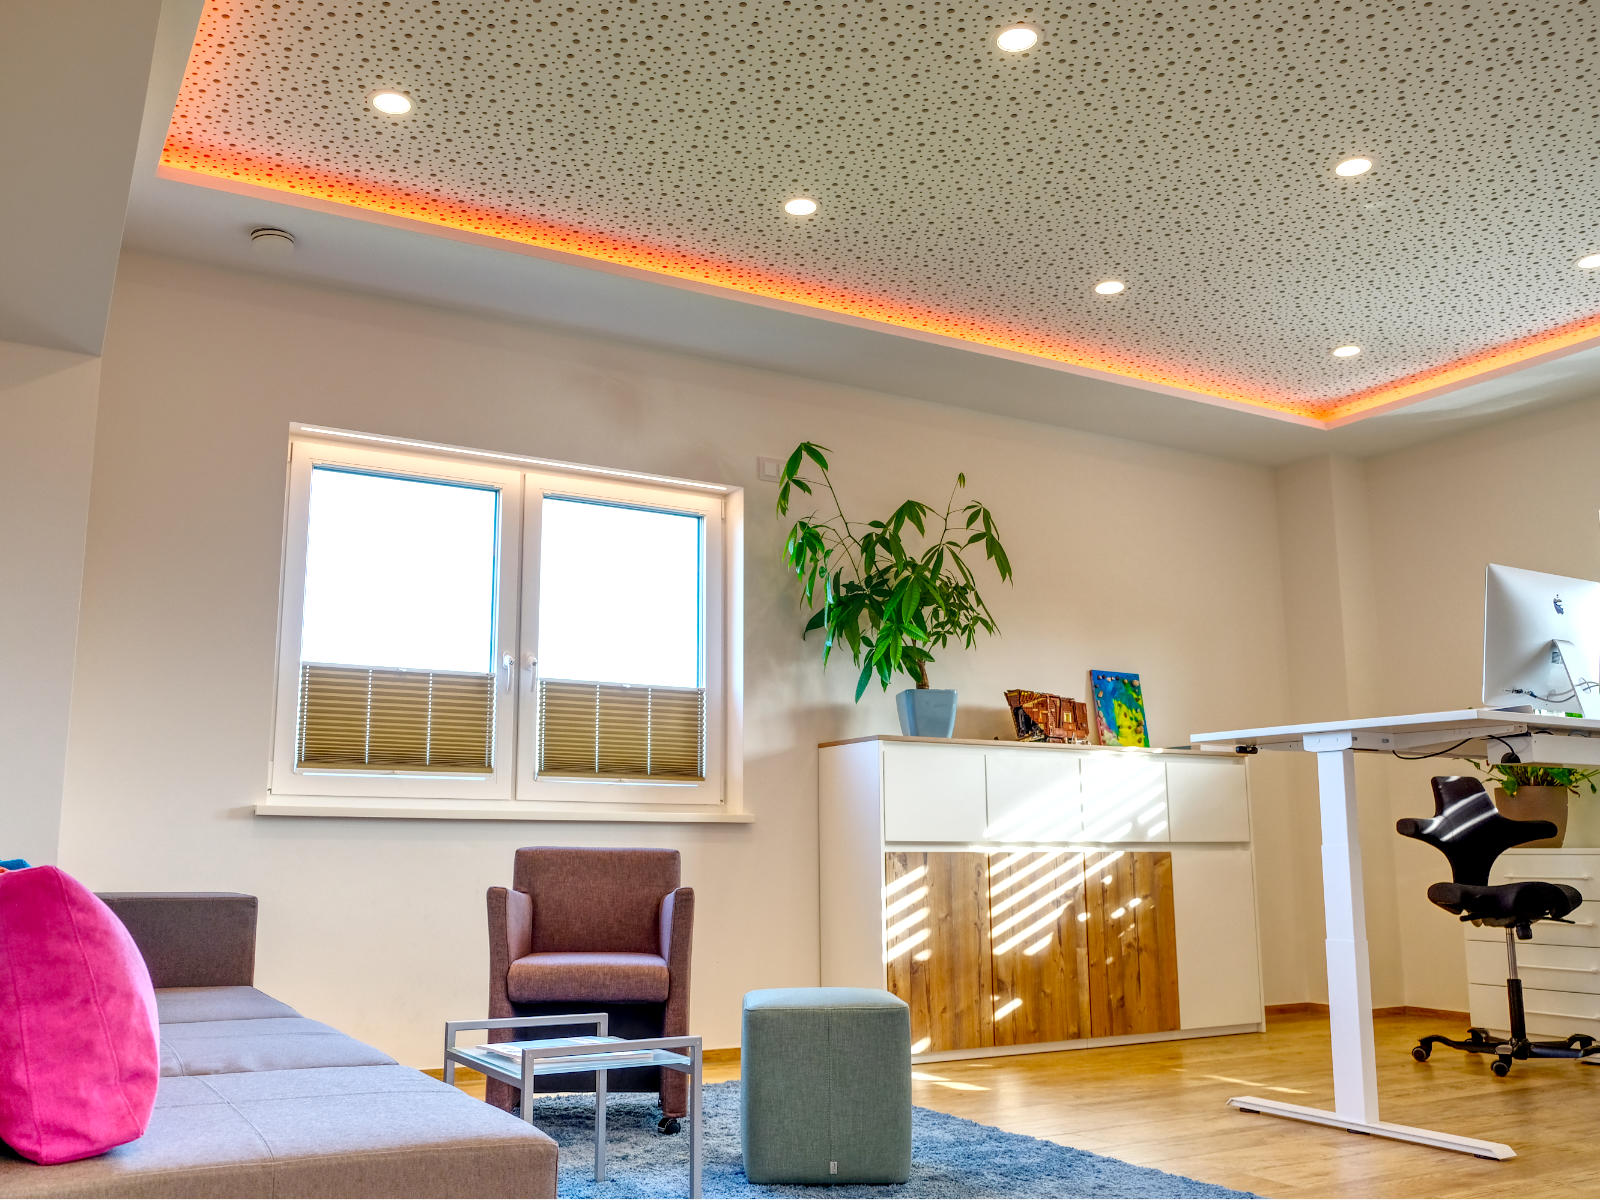 Akustik Rigips Decke mit indirekter RGB LED Beleuchtung und Panels